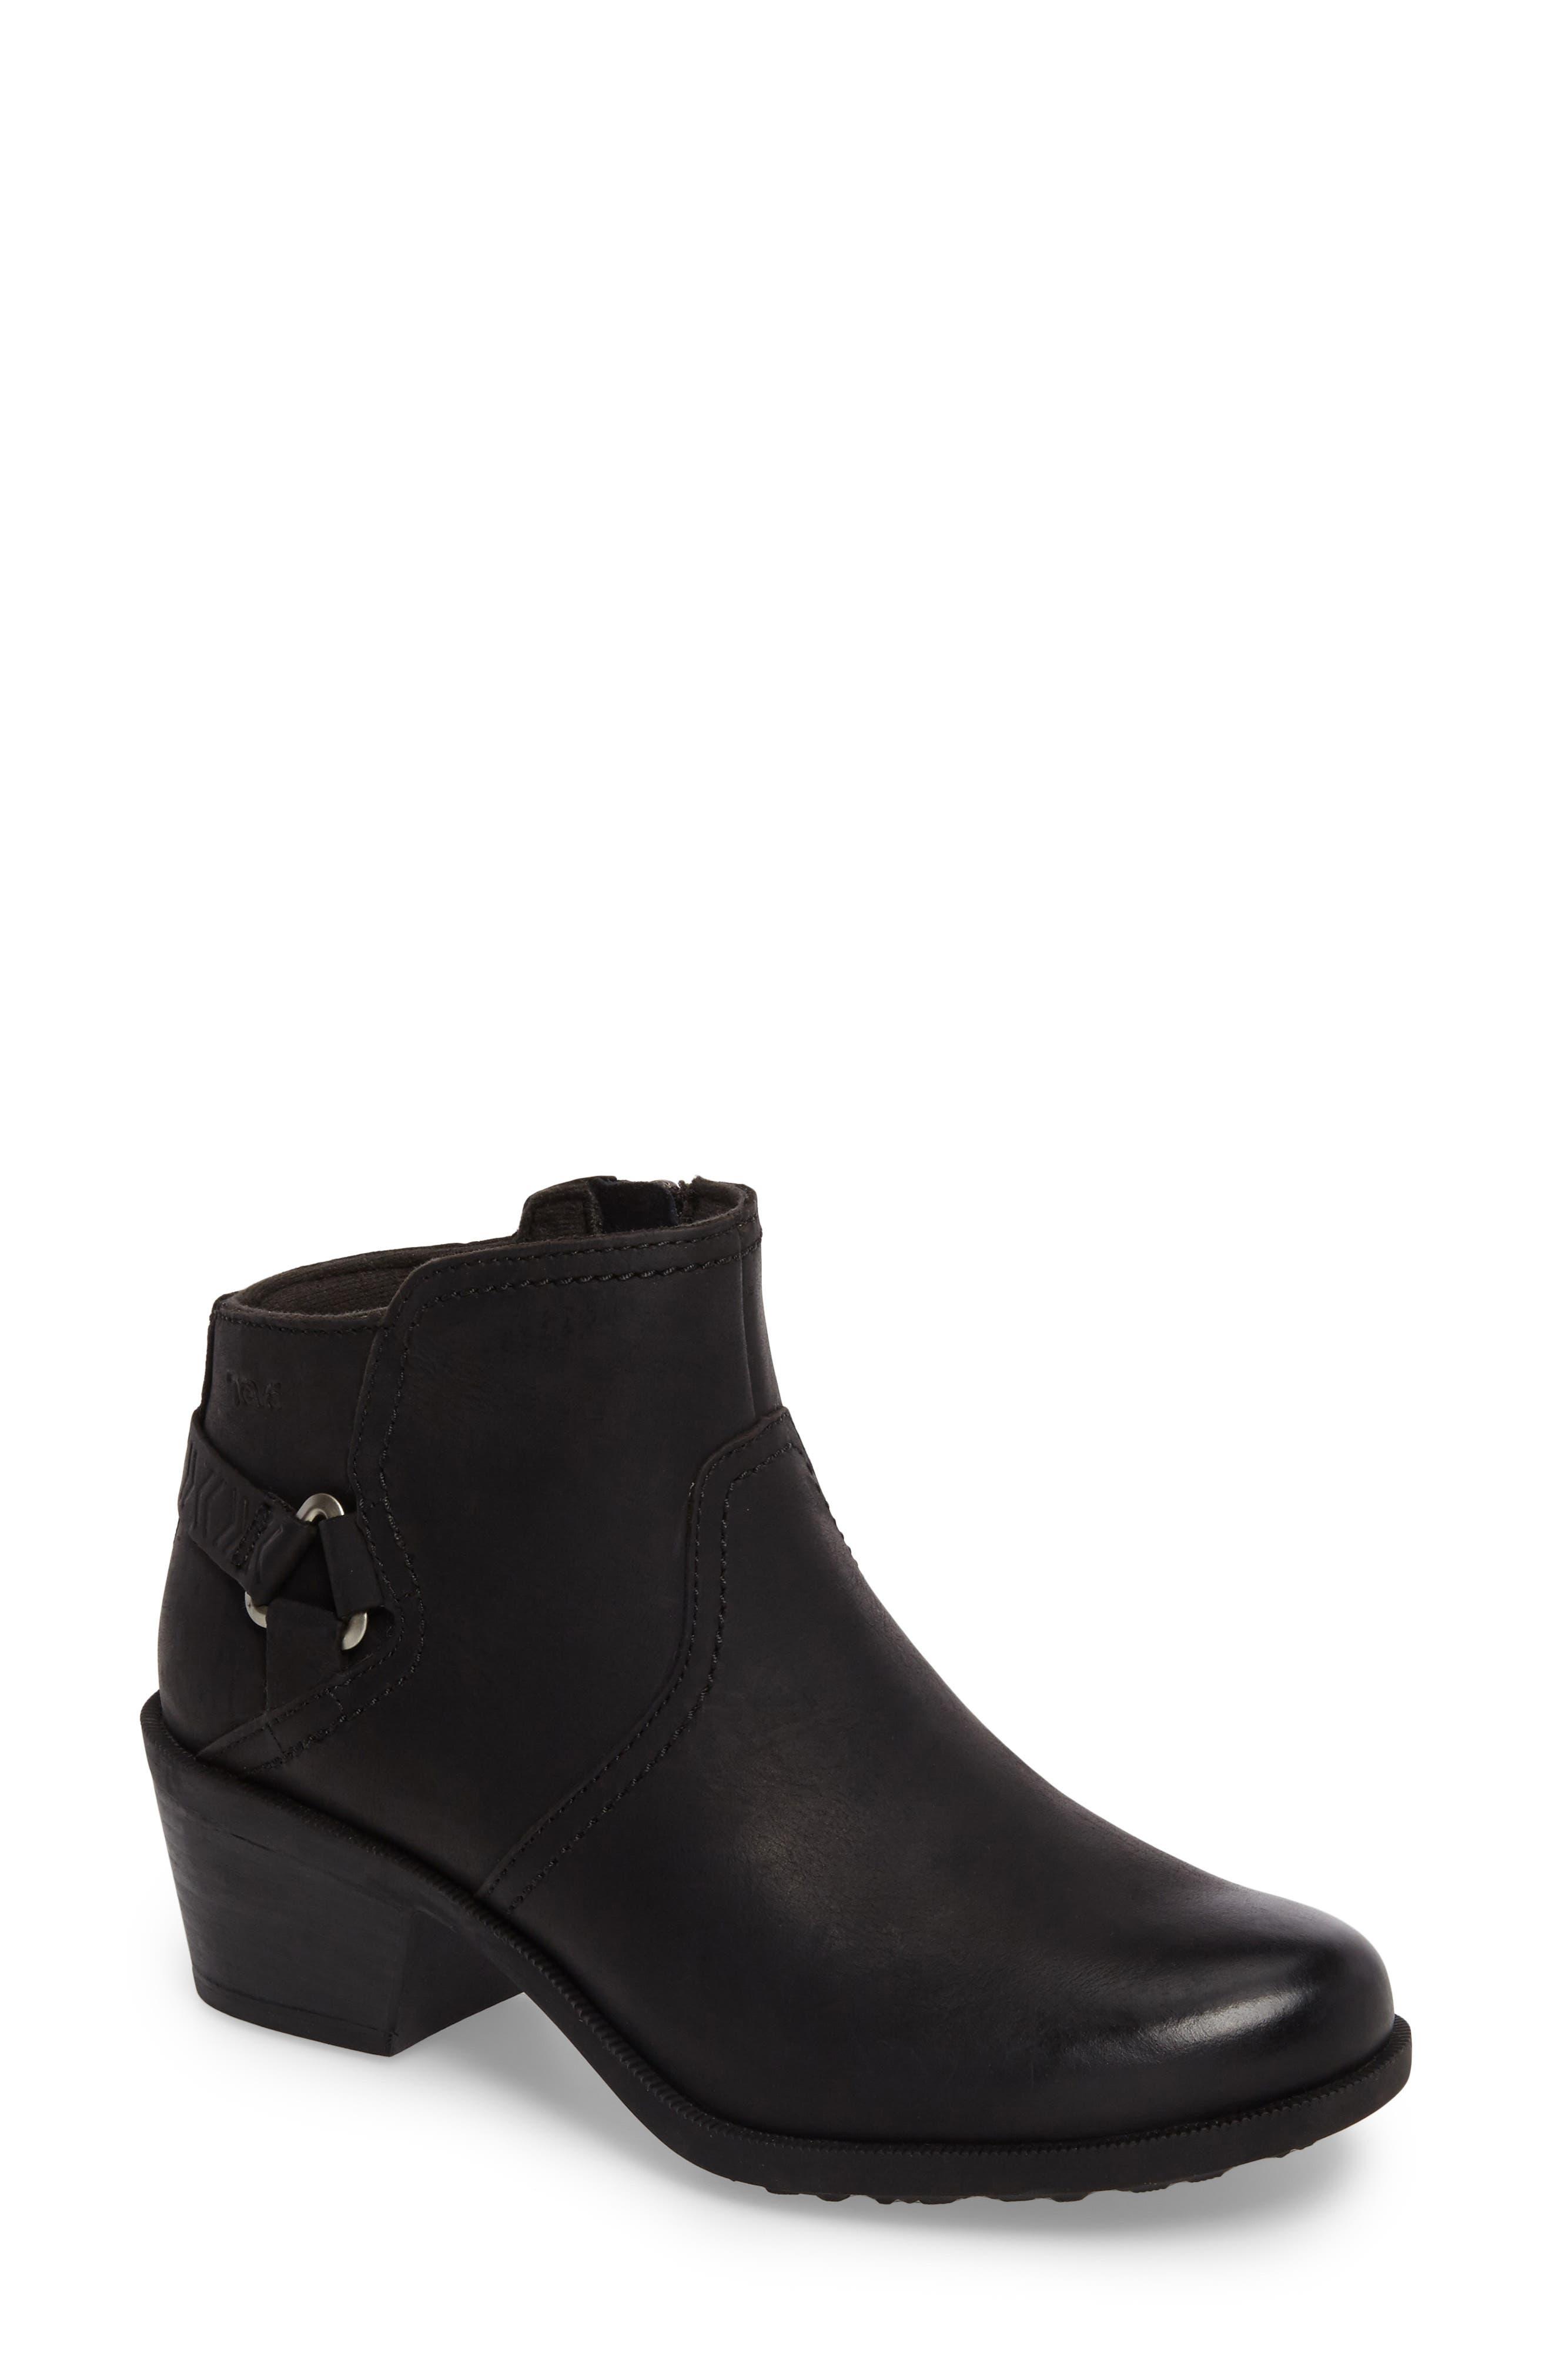 TEVA 'Foxy' Bootie in Black Leather